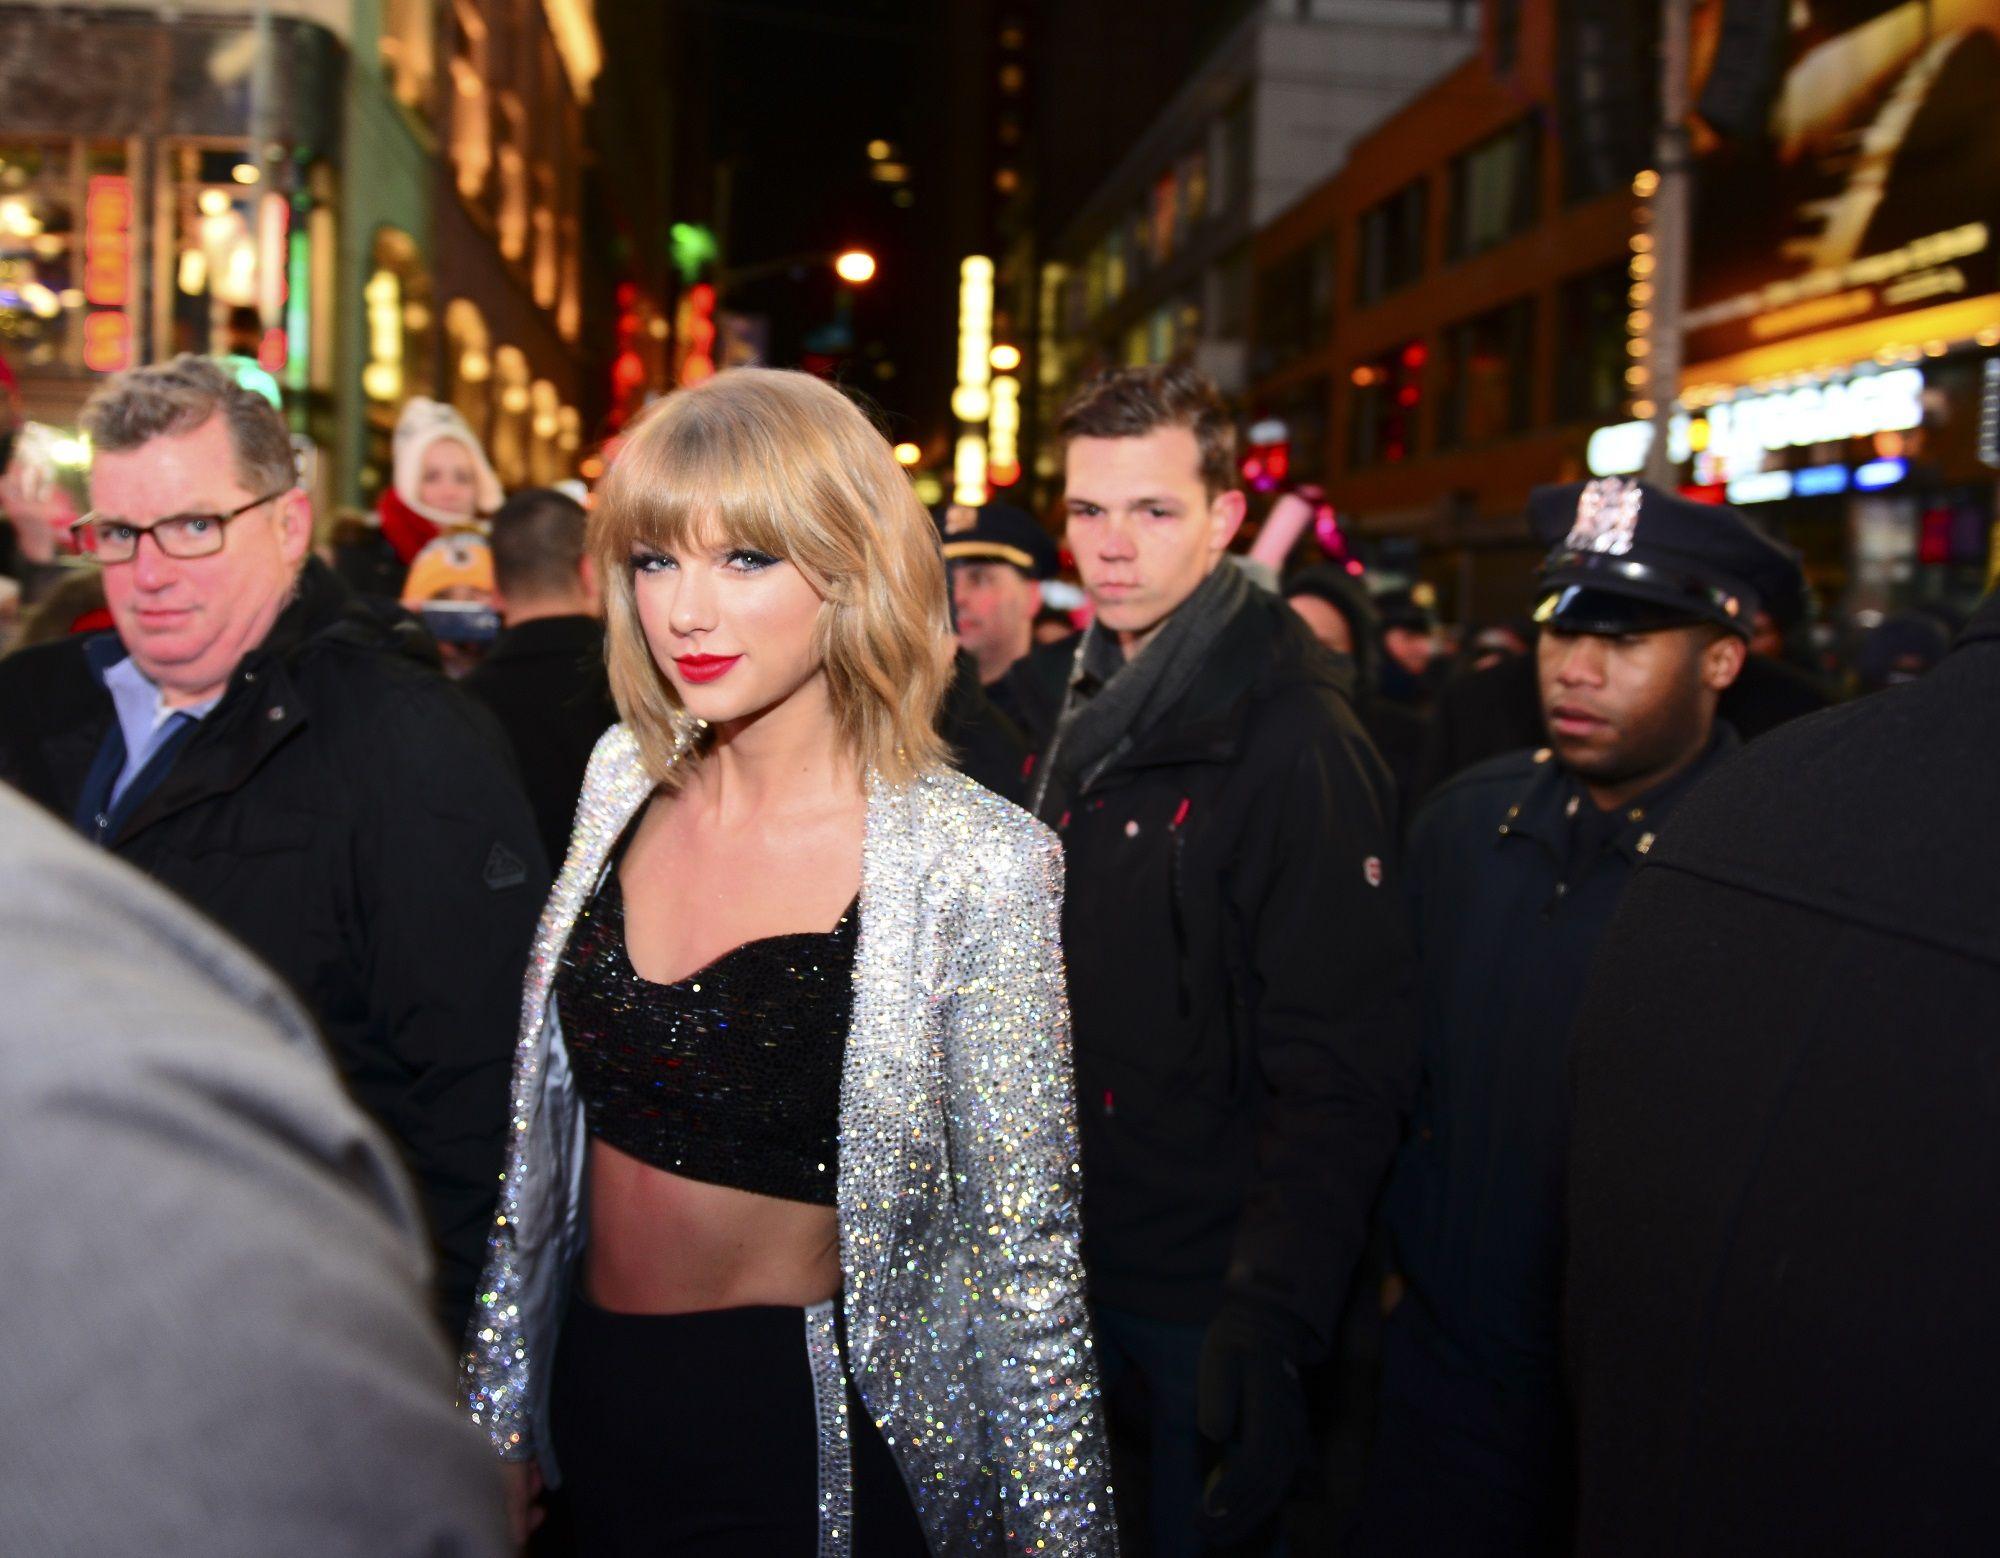 15. Taylor Swift